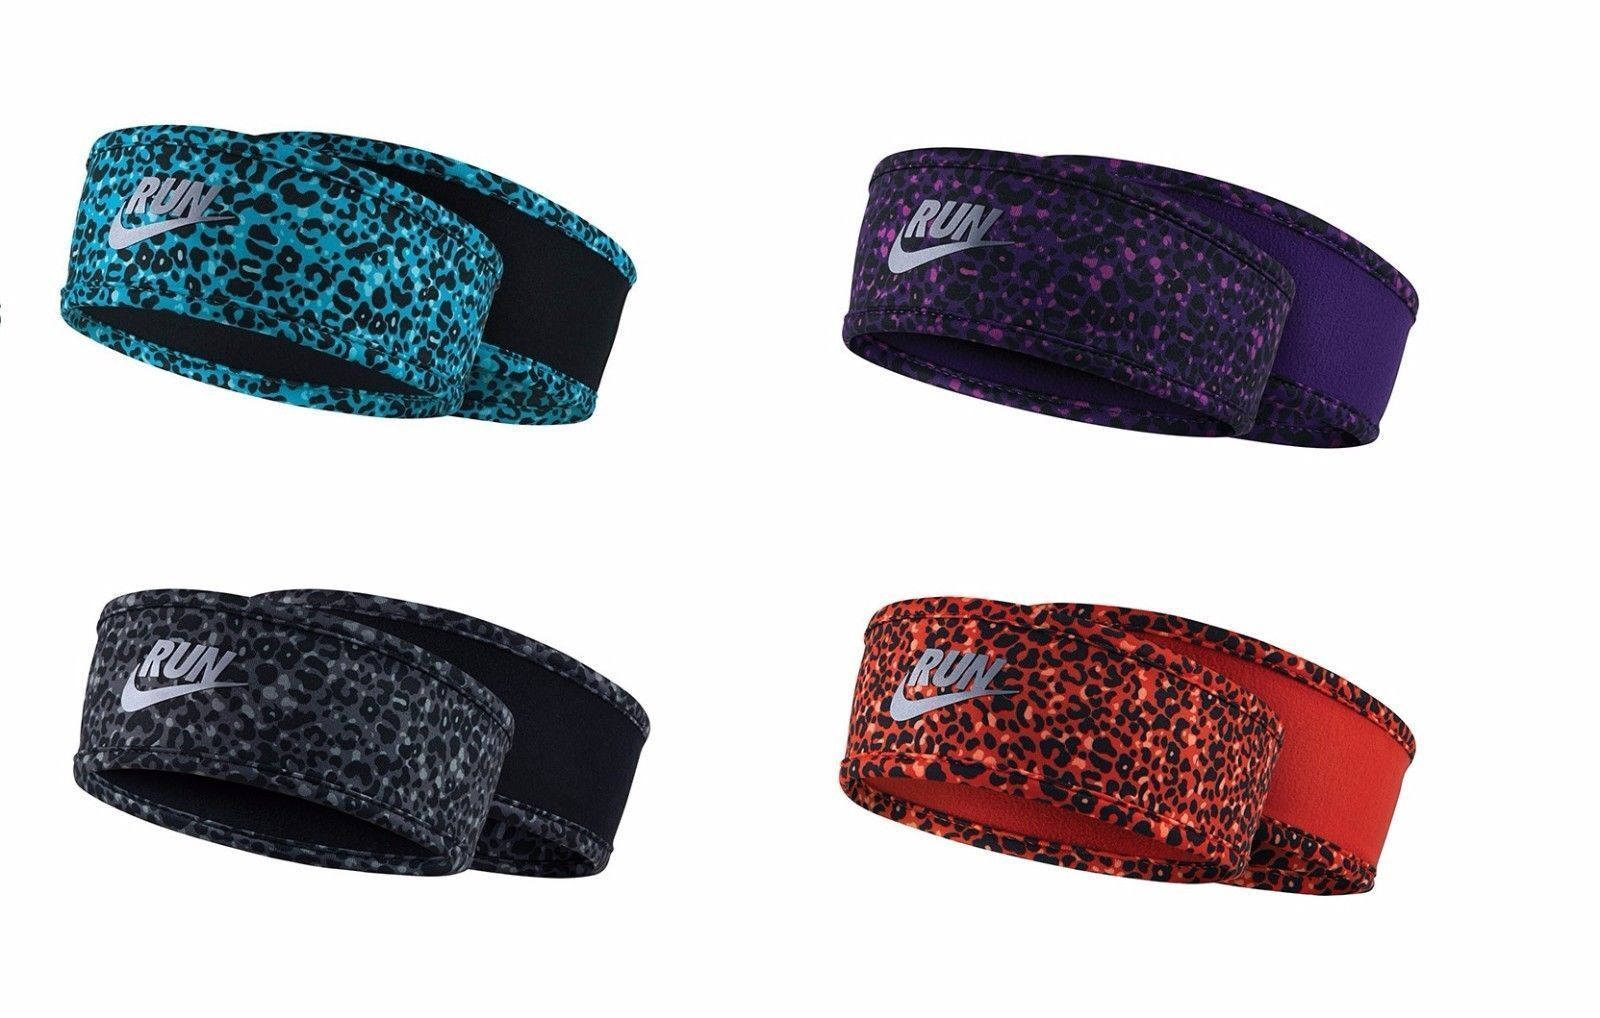 Nike Lotus Running Fitness Dri-Fit Fleece Headband Leopard 8